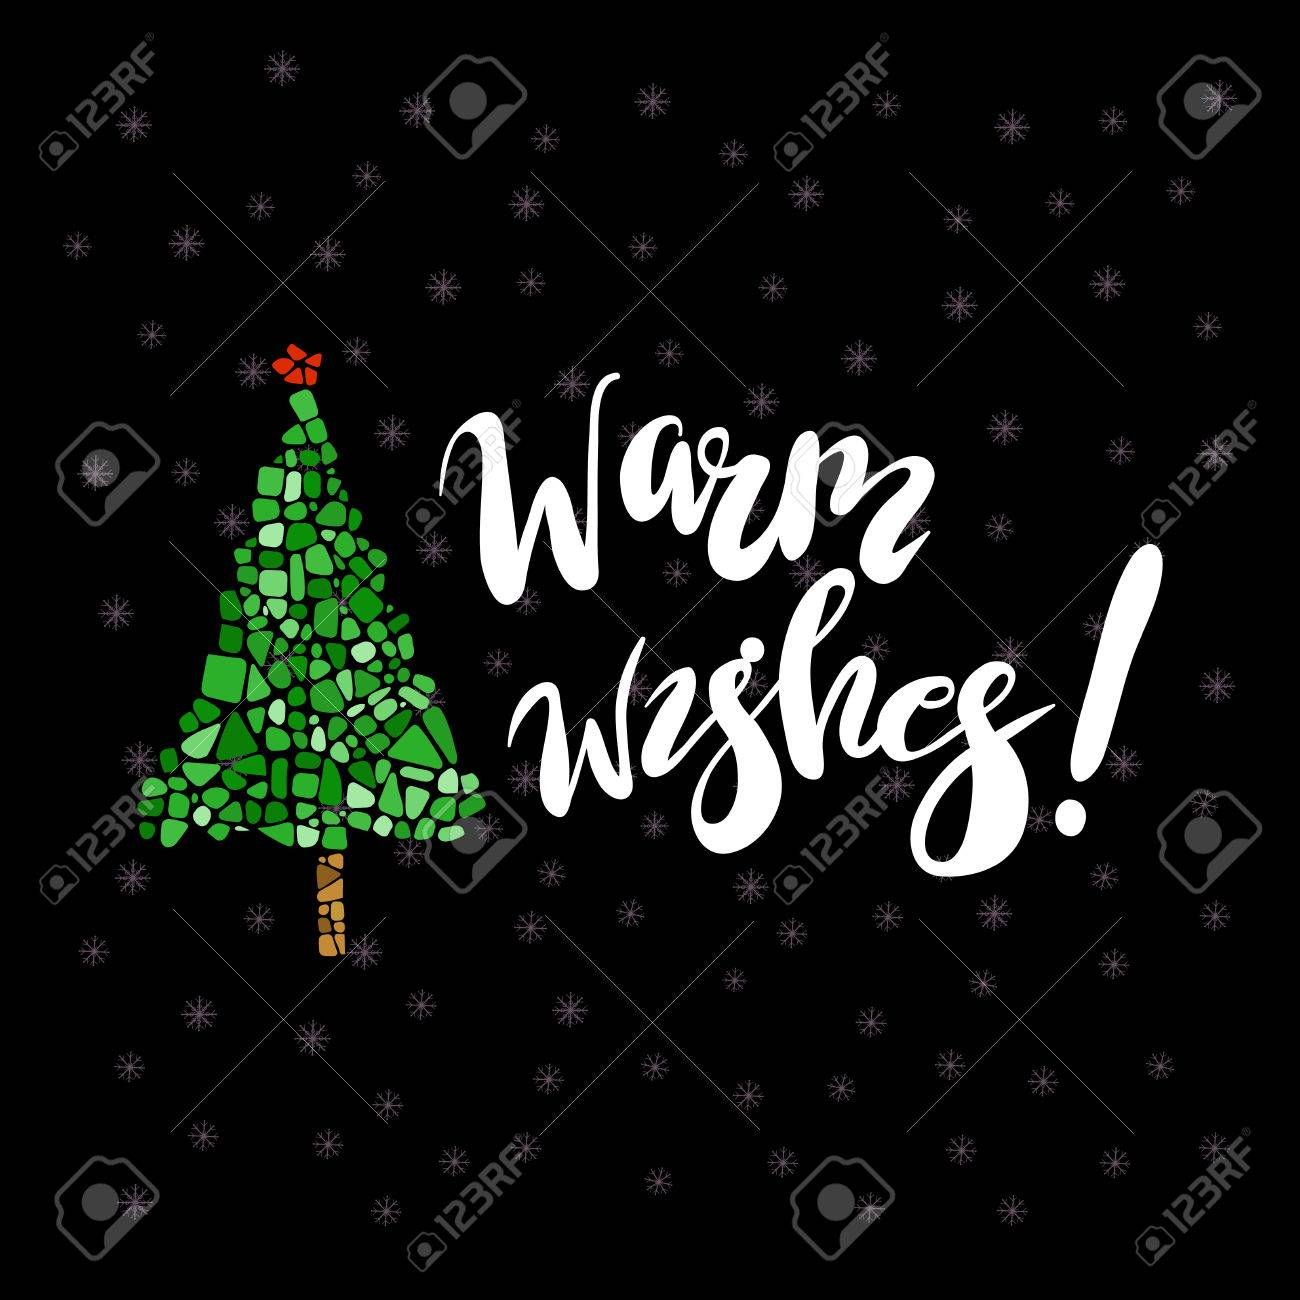 Happy new year greeting card mosaic christmas tree warm wishes happy new year greeting card mosaic christmas tree warm wishes letering design element m4hsunfo